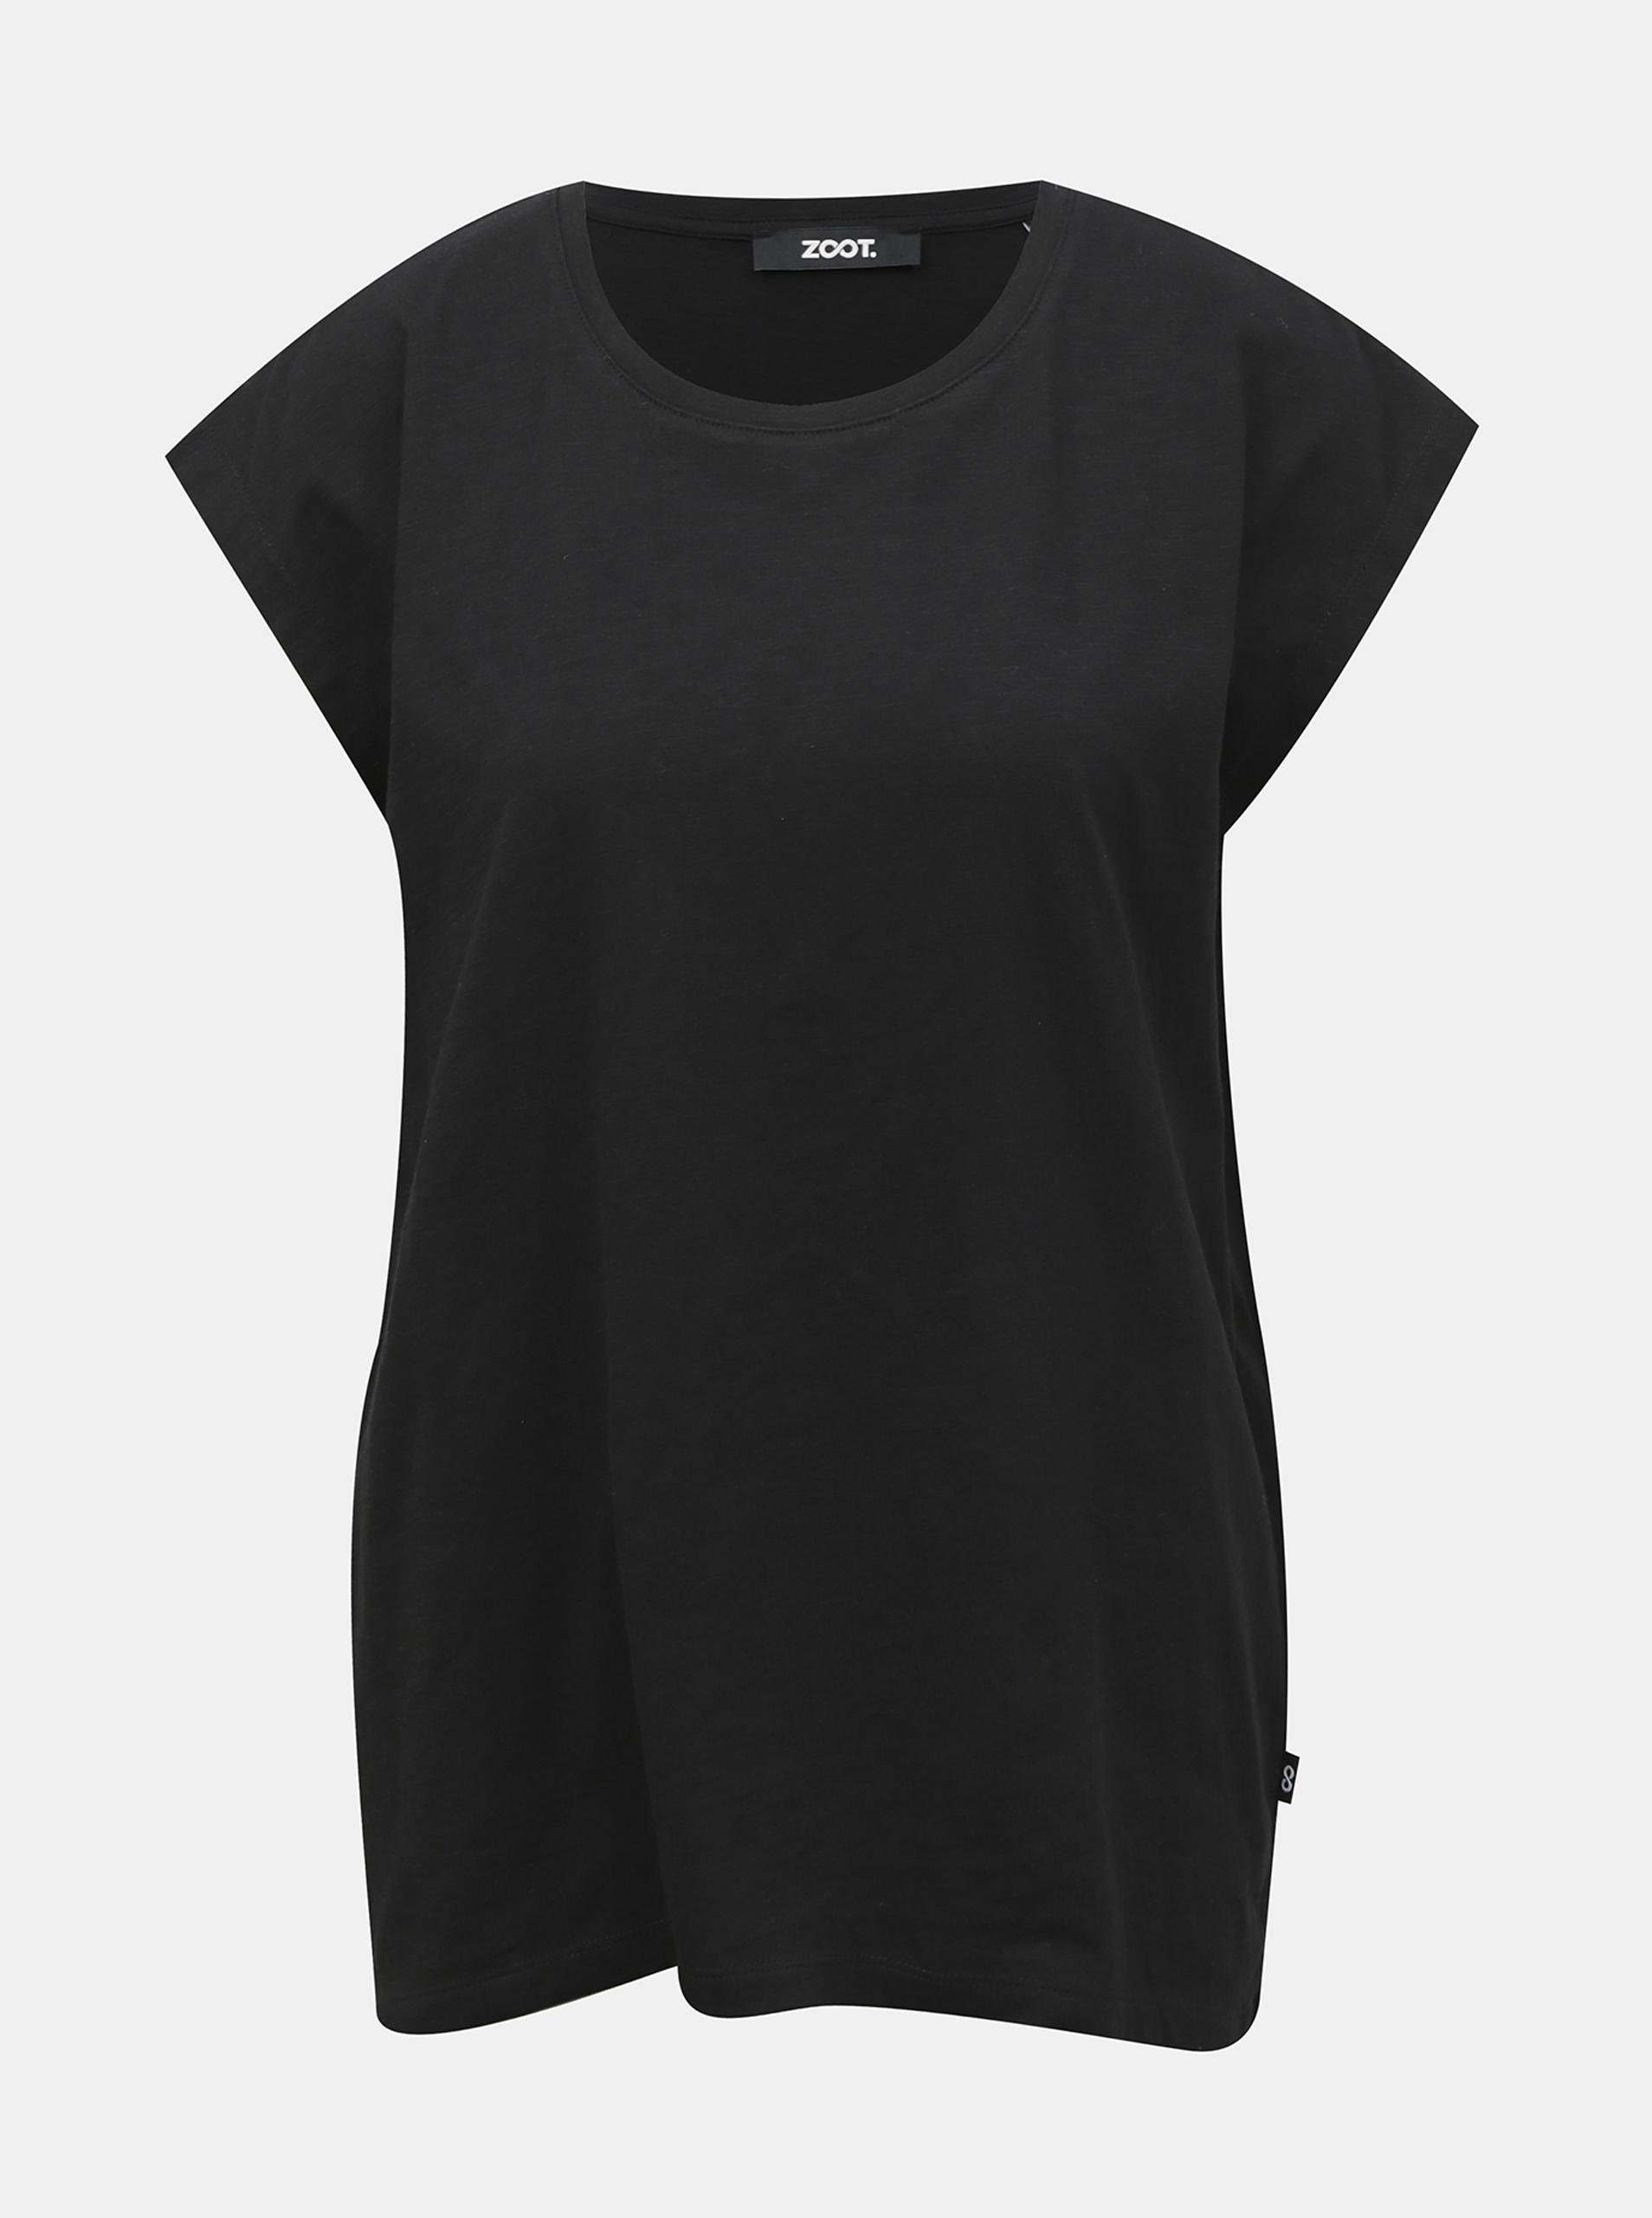 ZOOT black T-shirt June